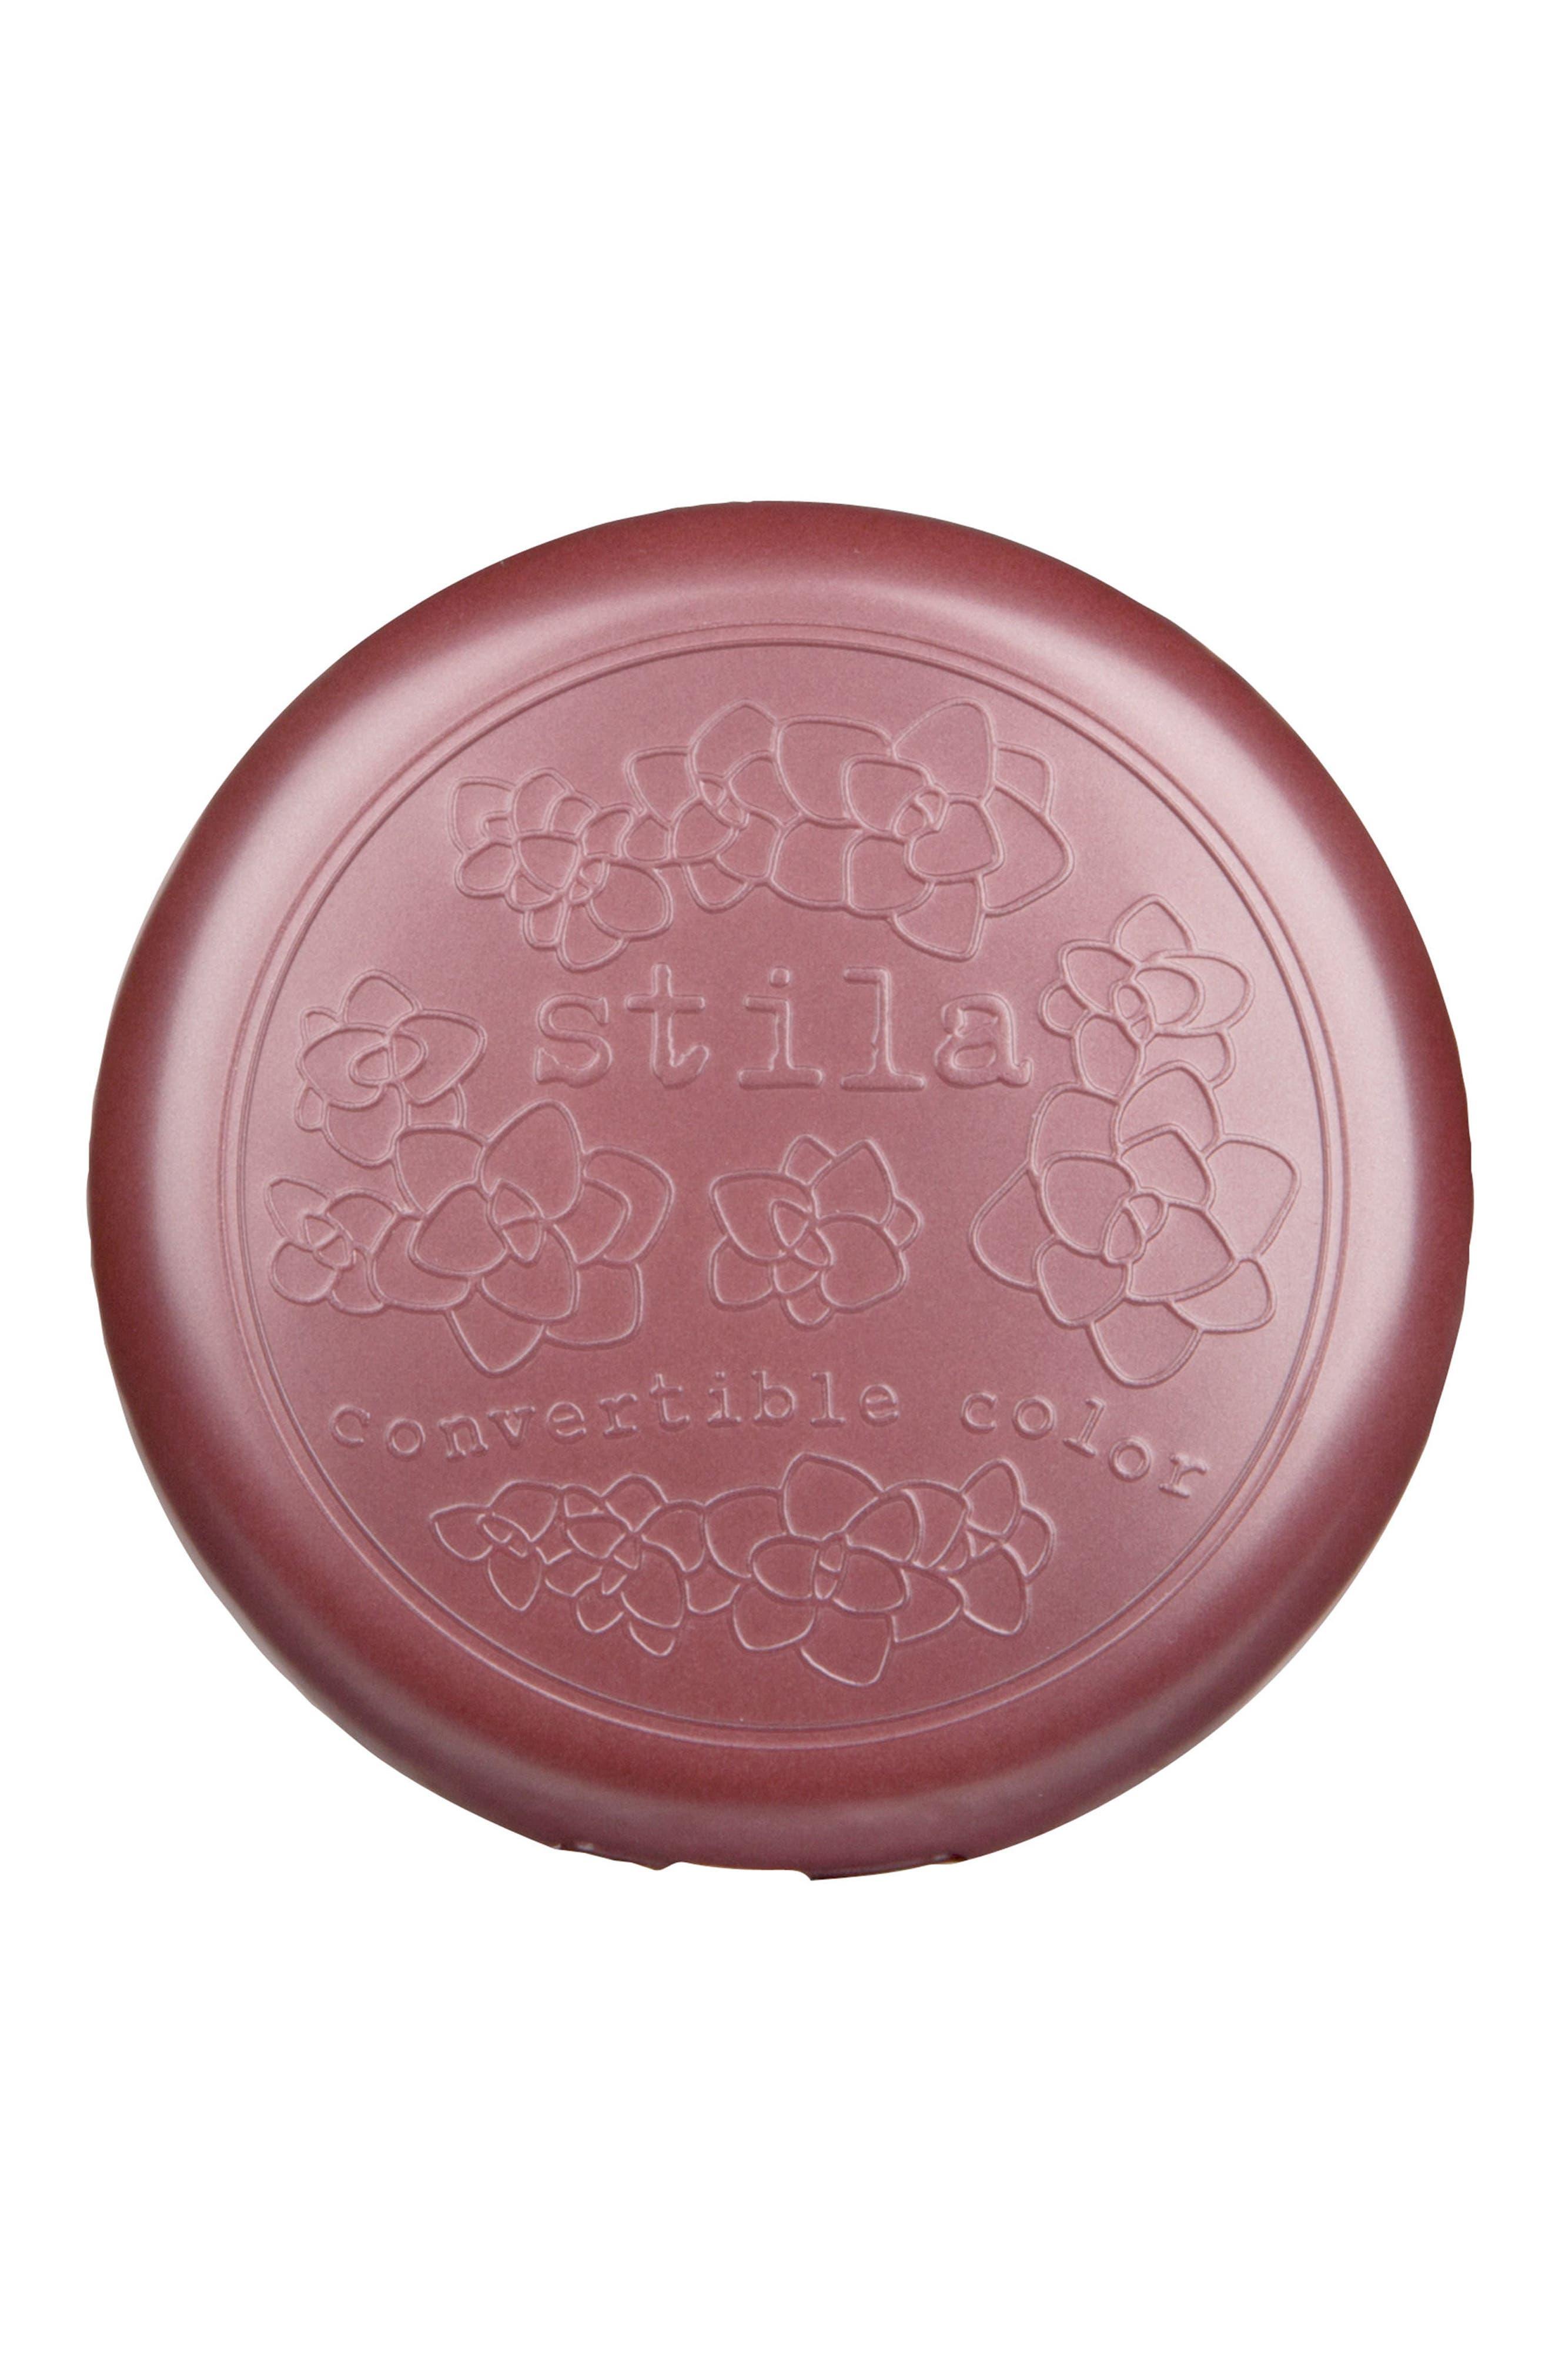 Main Image - Stila Convertible Color Dual Lip & Cheek Cream